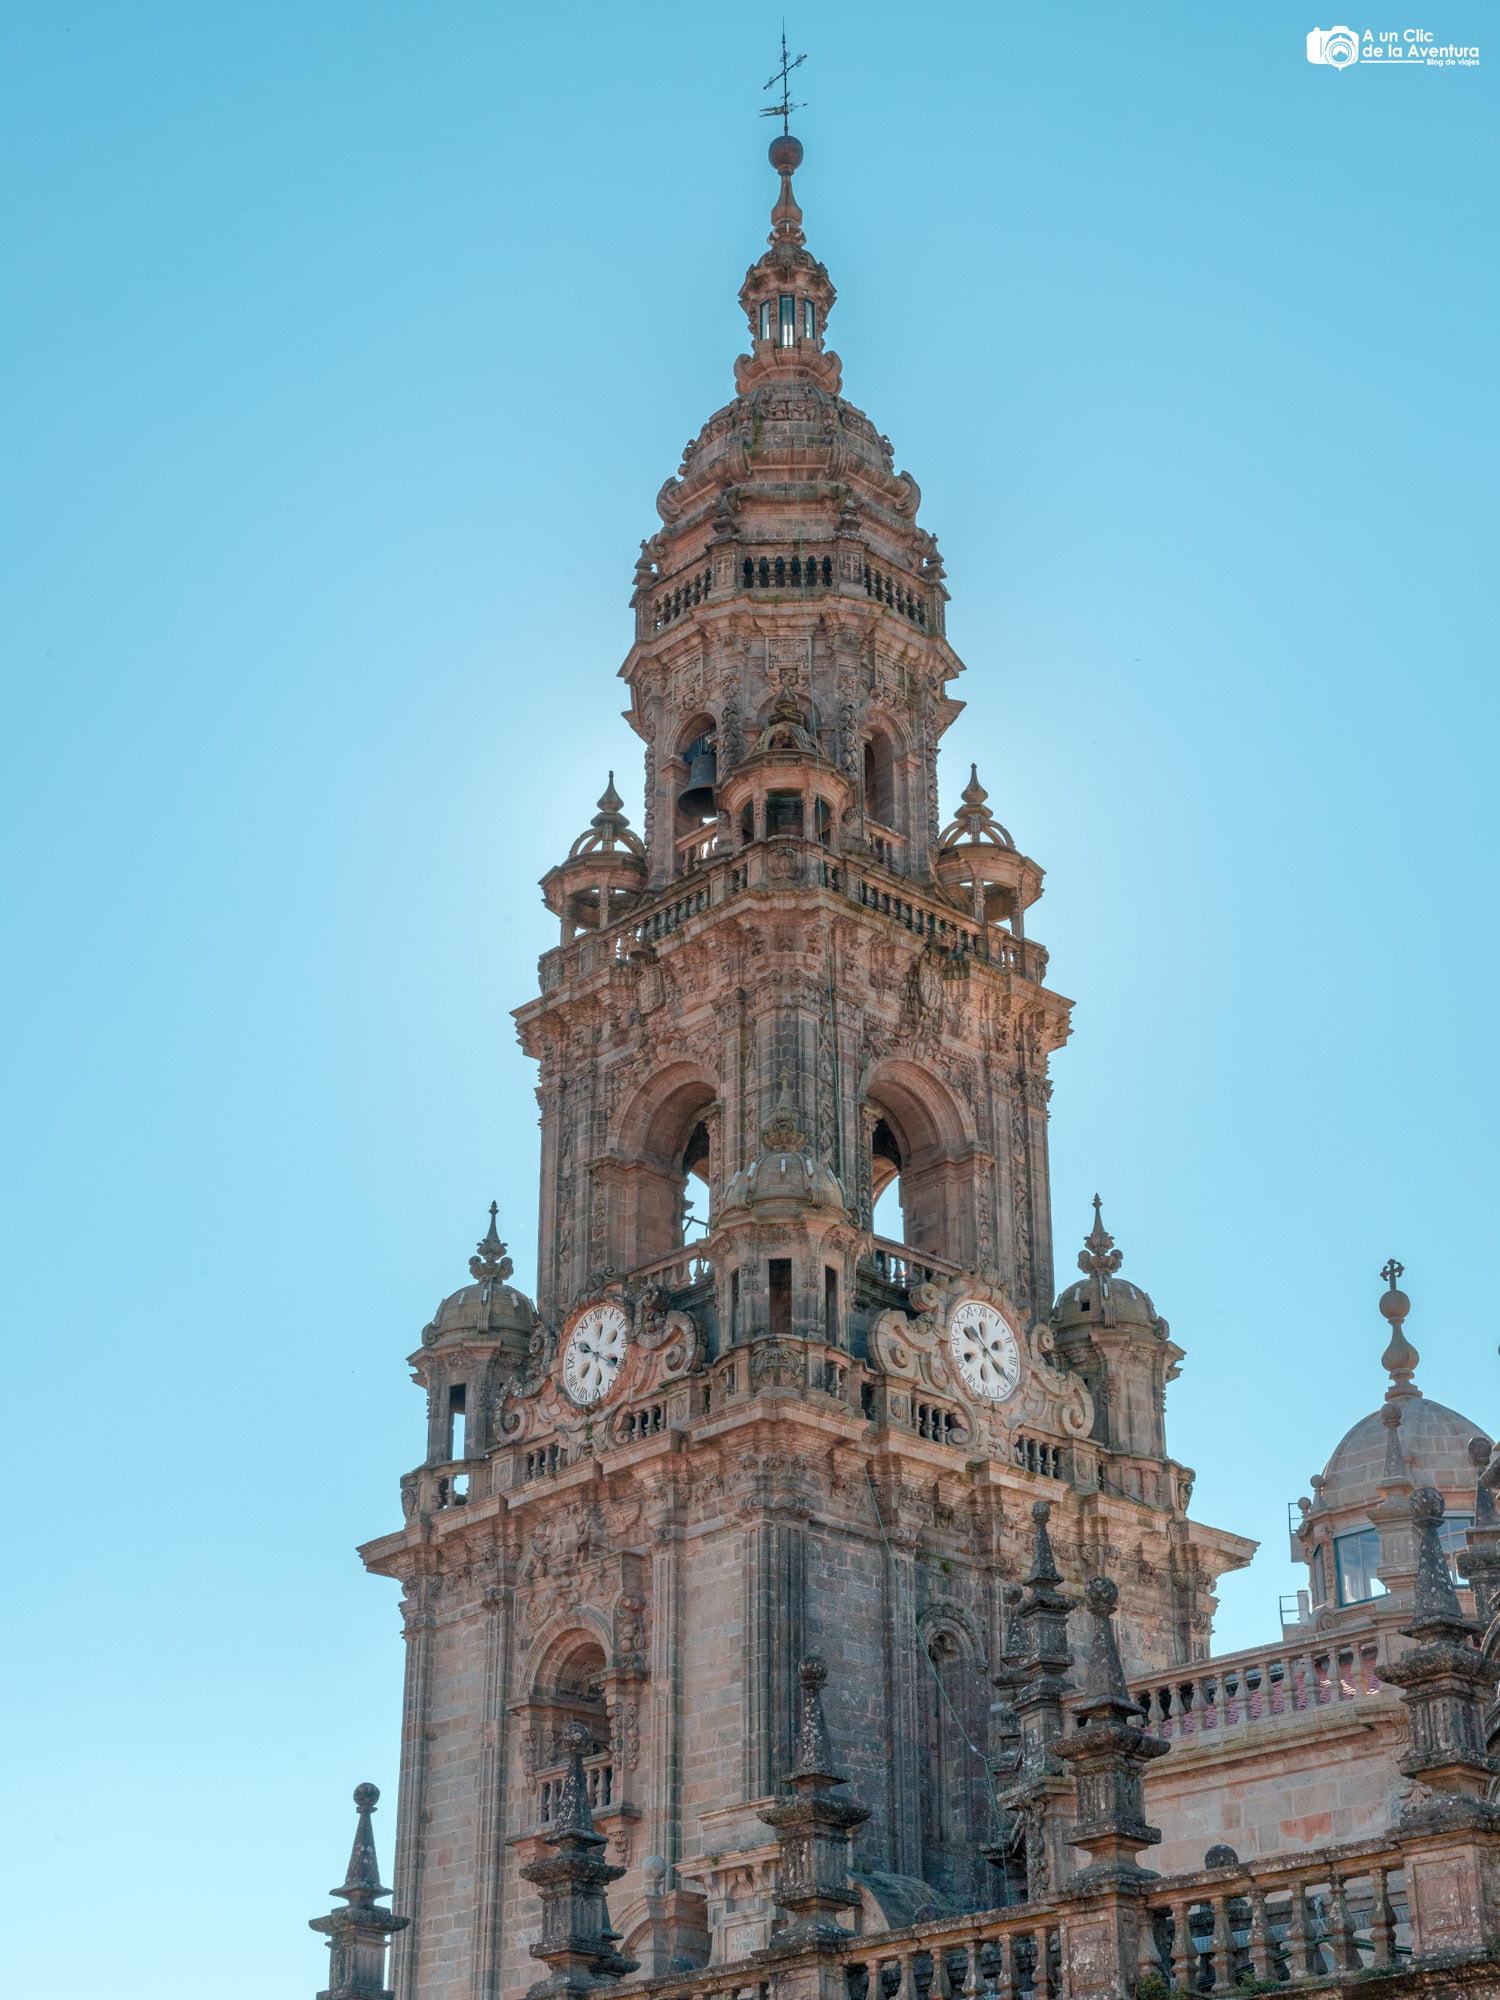 Torre del Reloj o Berenguela, Catedral de Santiago de Compostela